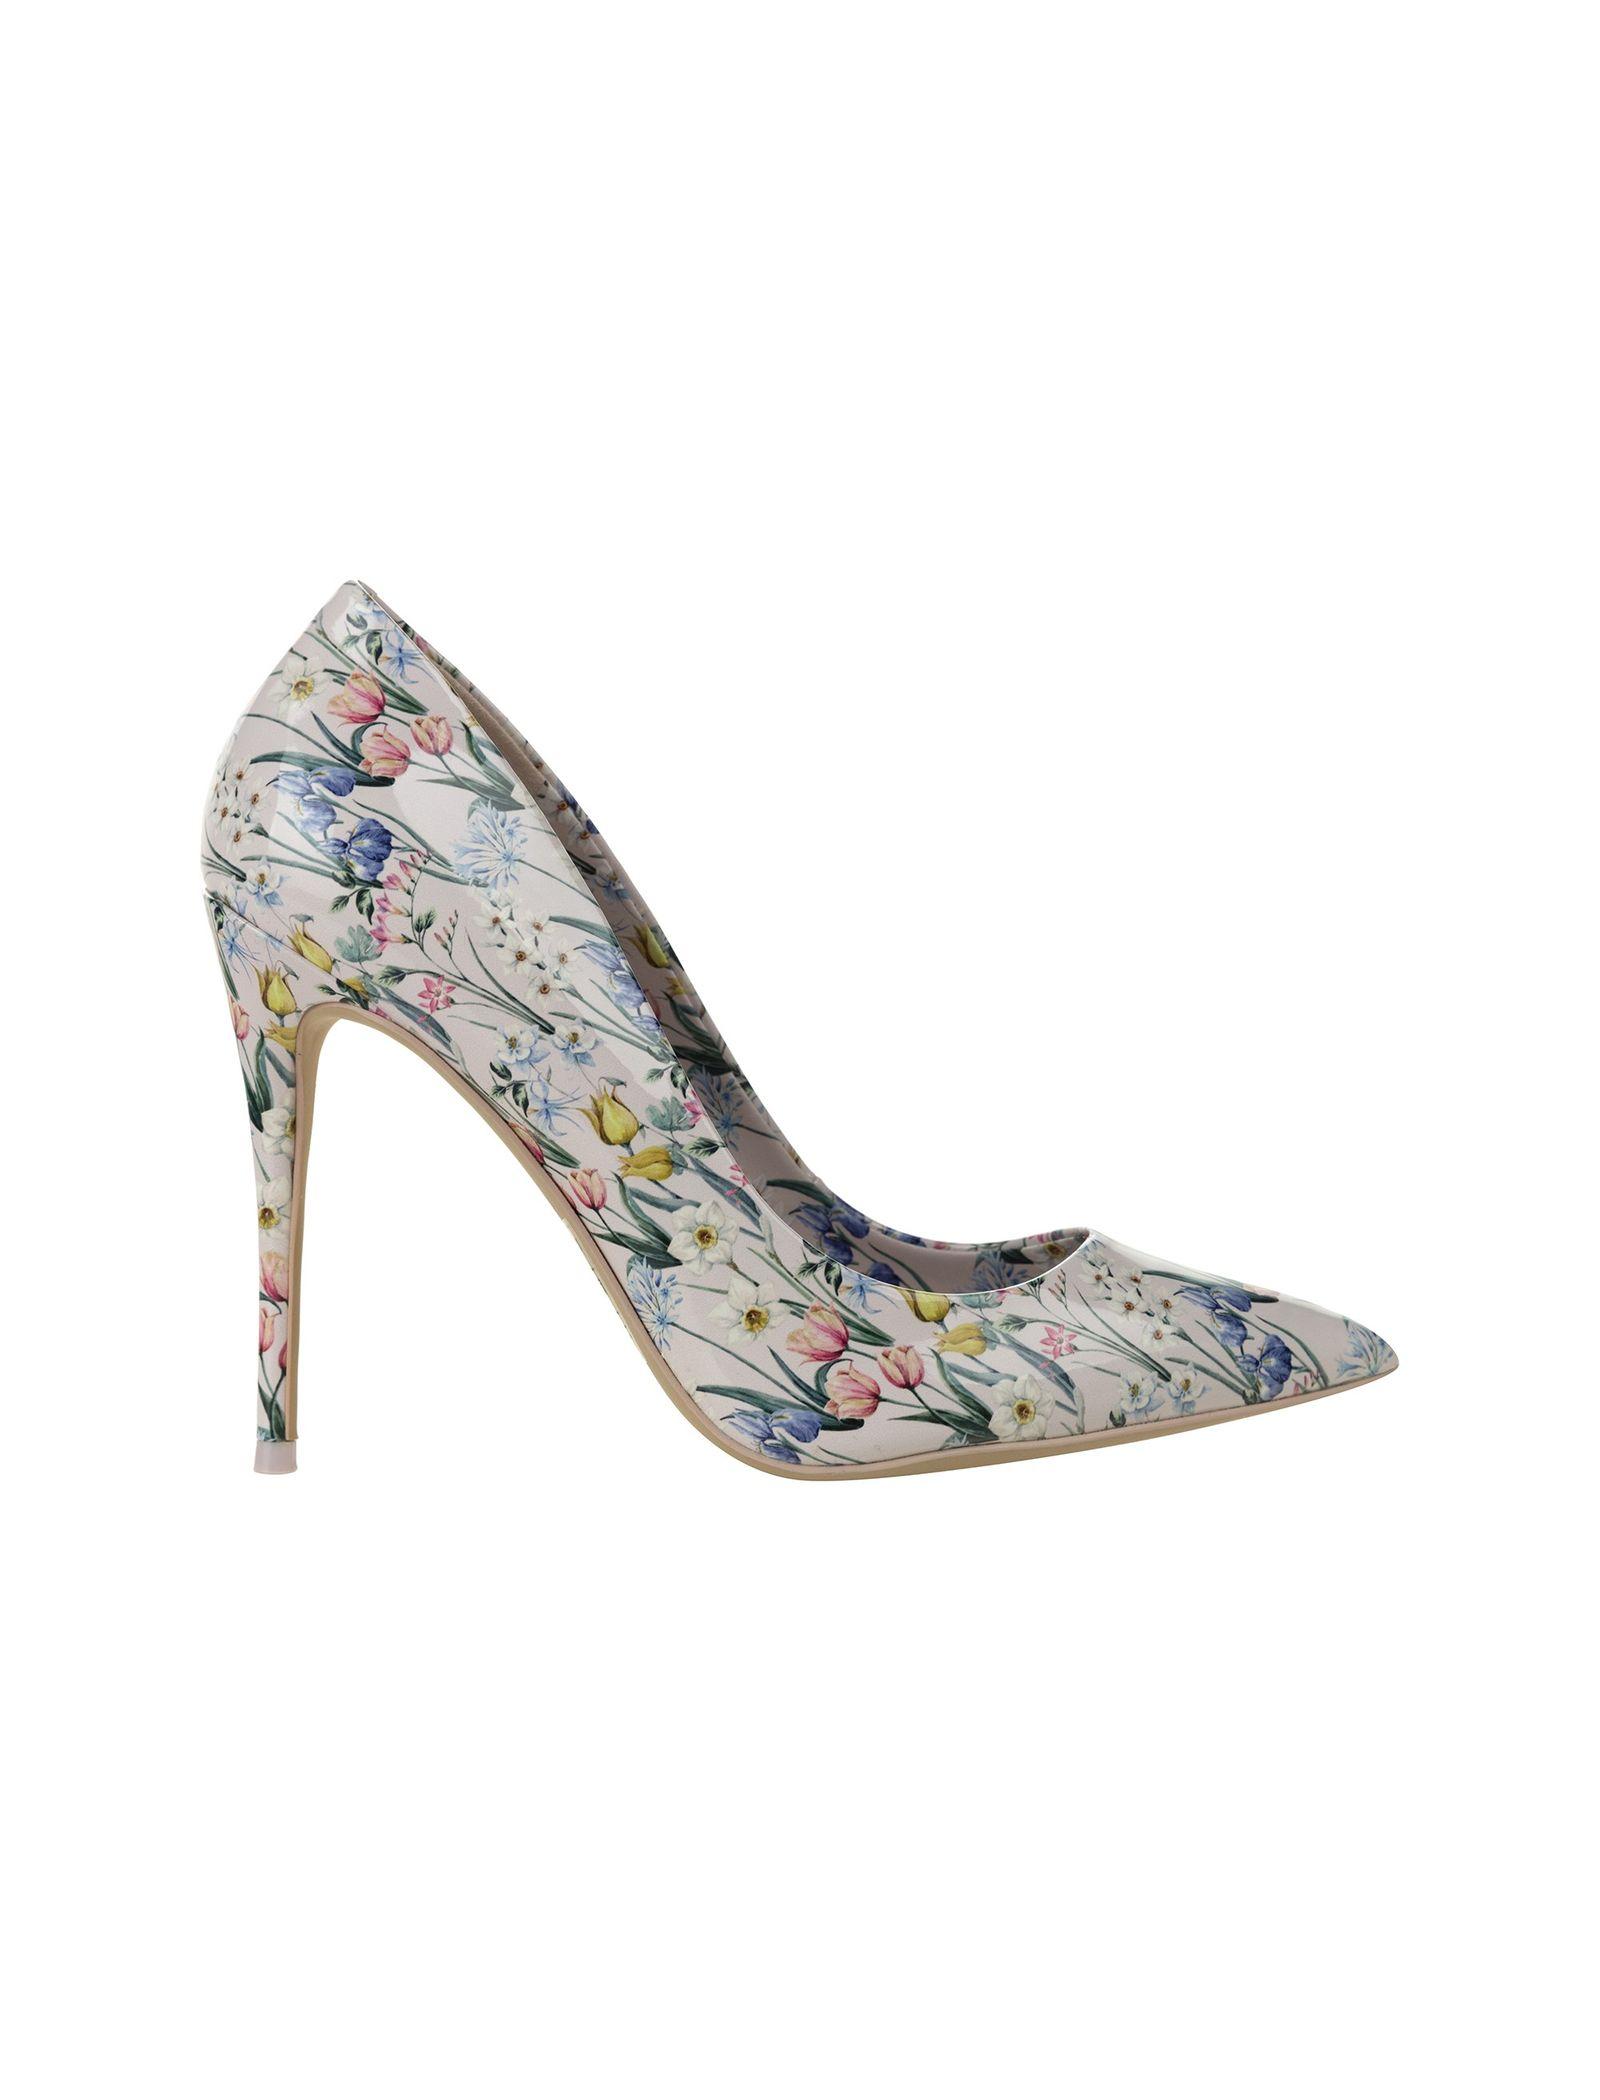 کفش پاشنه بلند زنانه - آلدو - صورتي  - 1